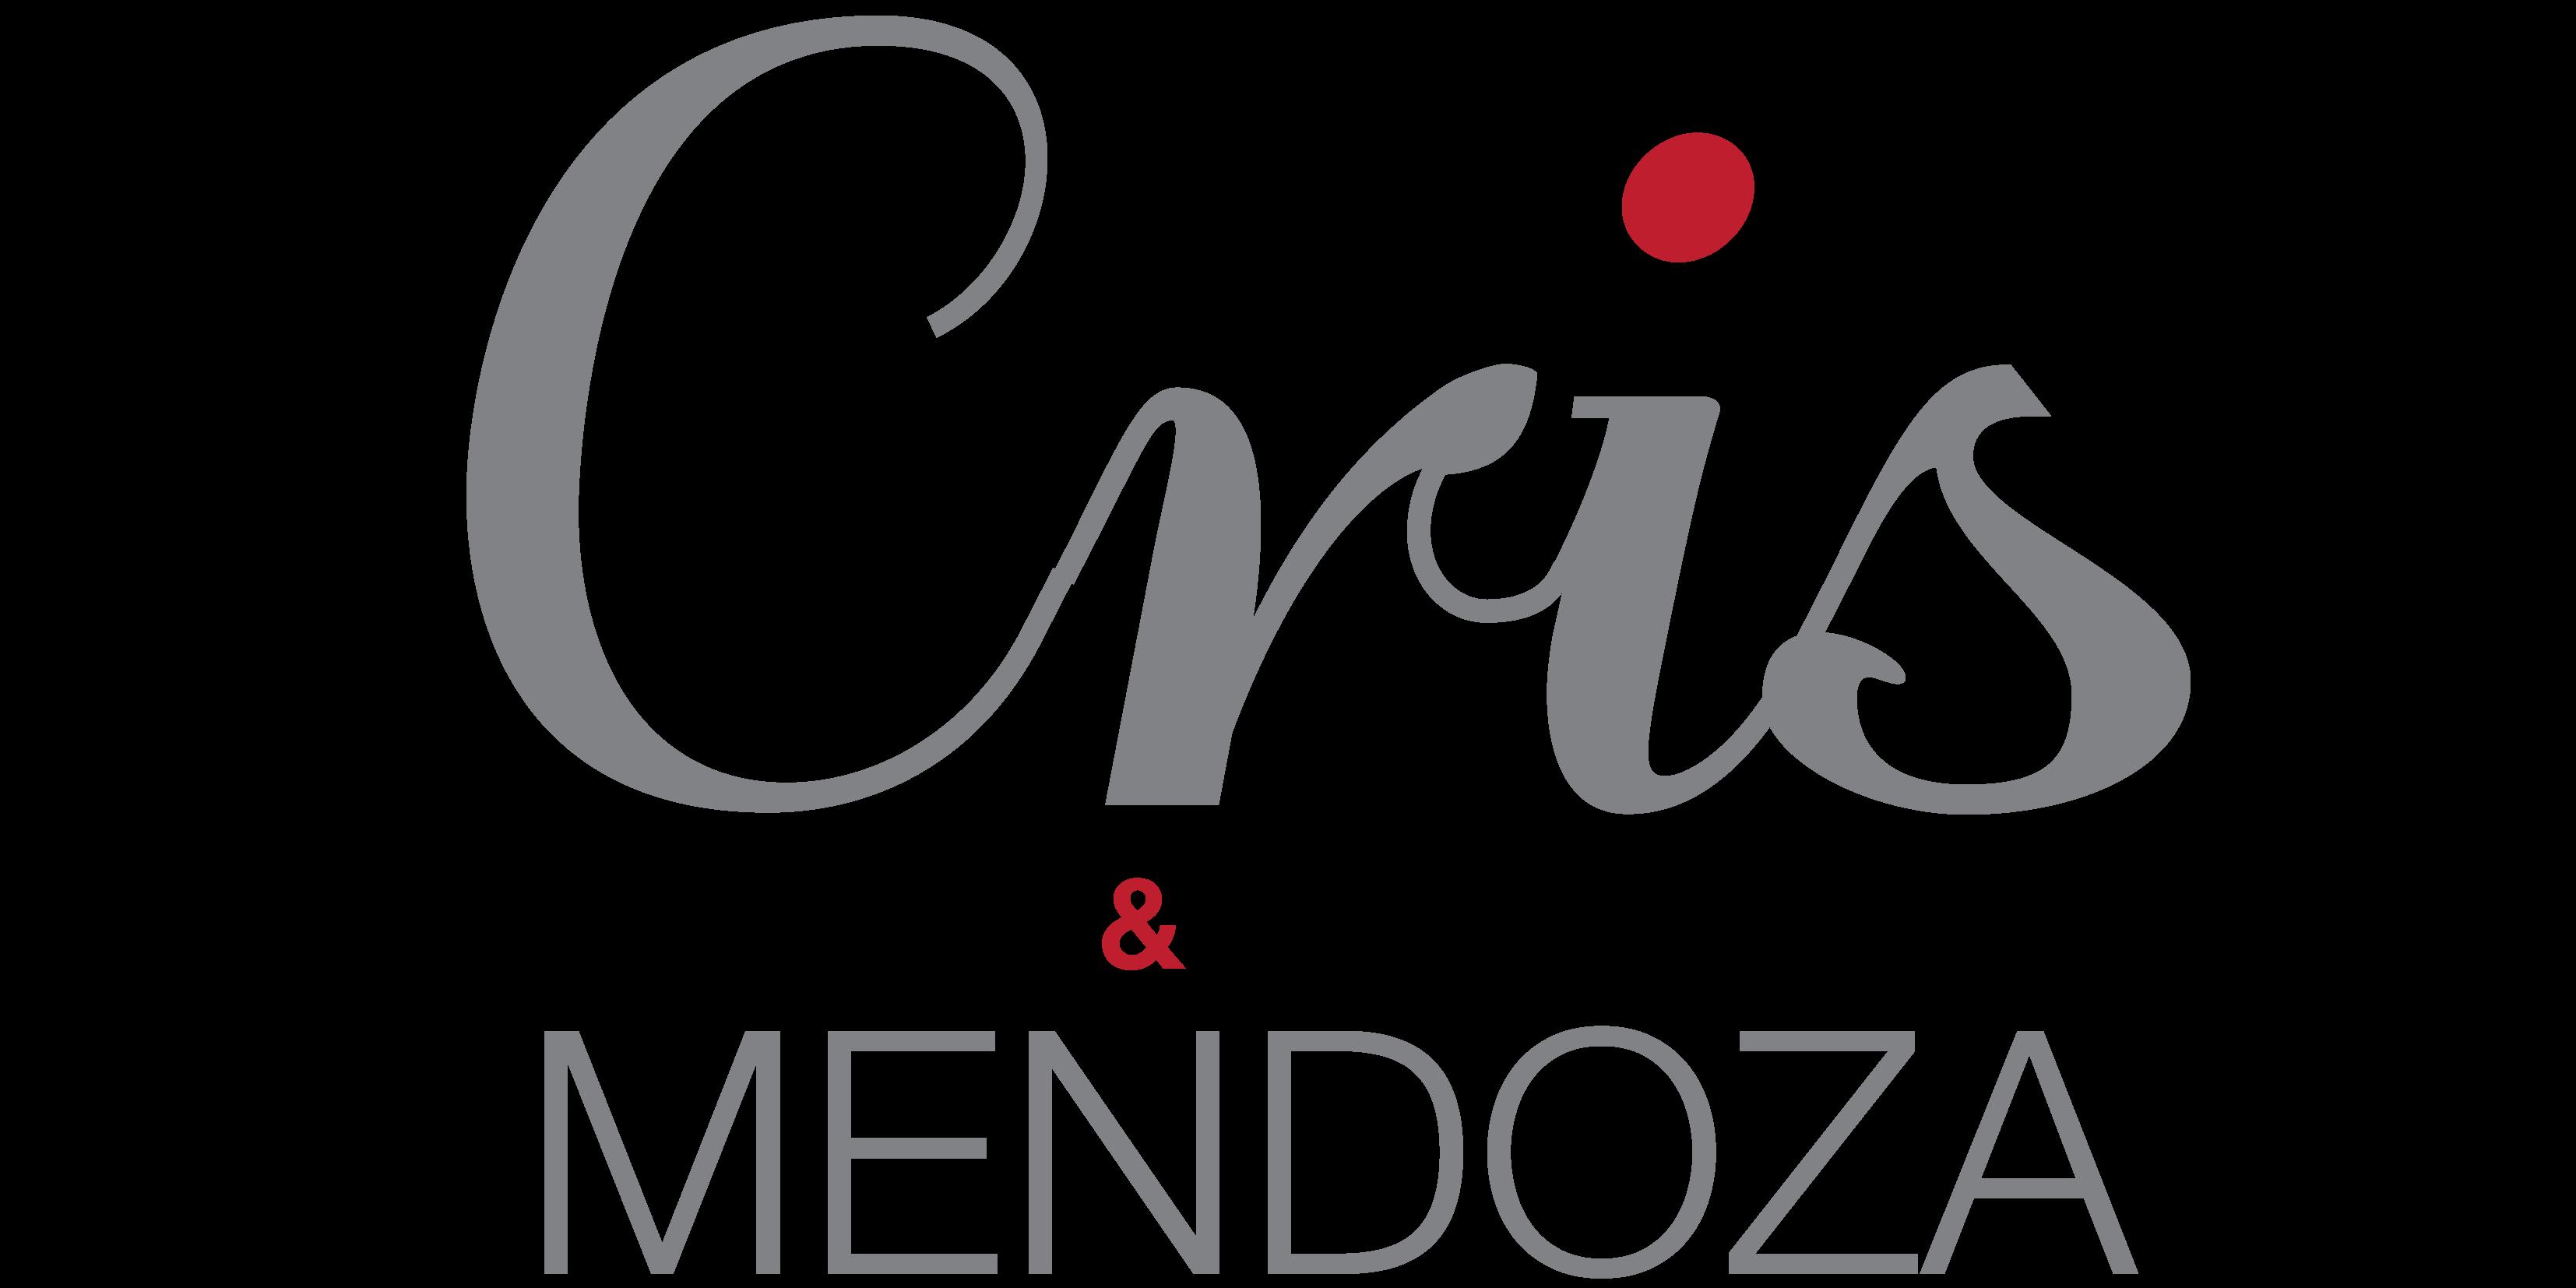 Cris Mendoza: estilo de vida.